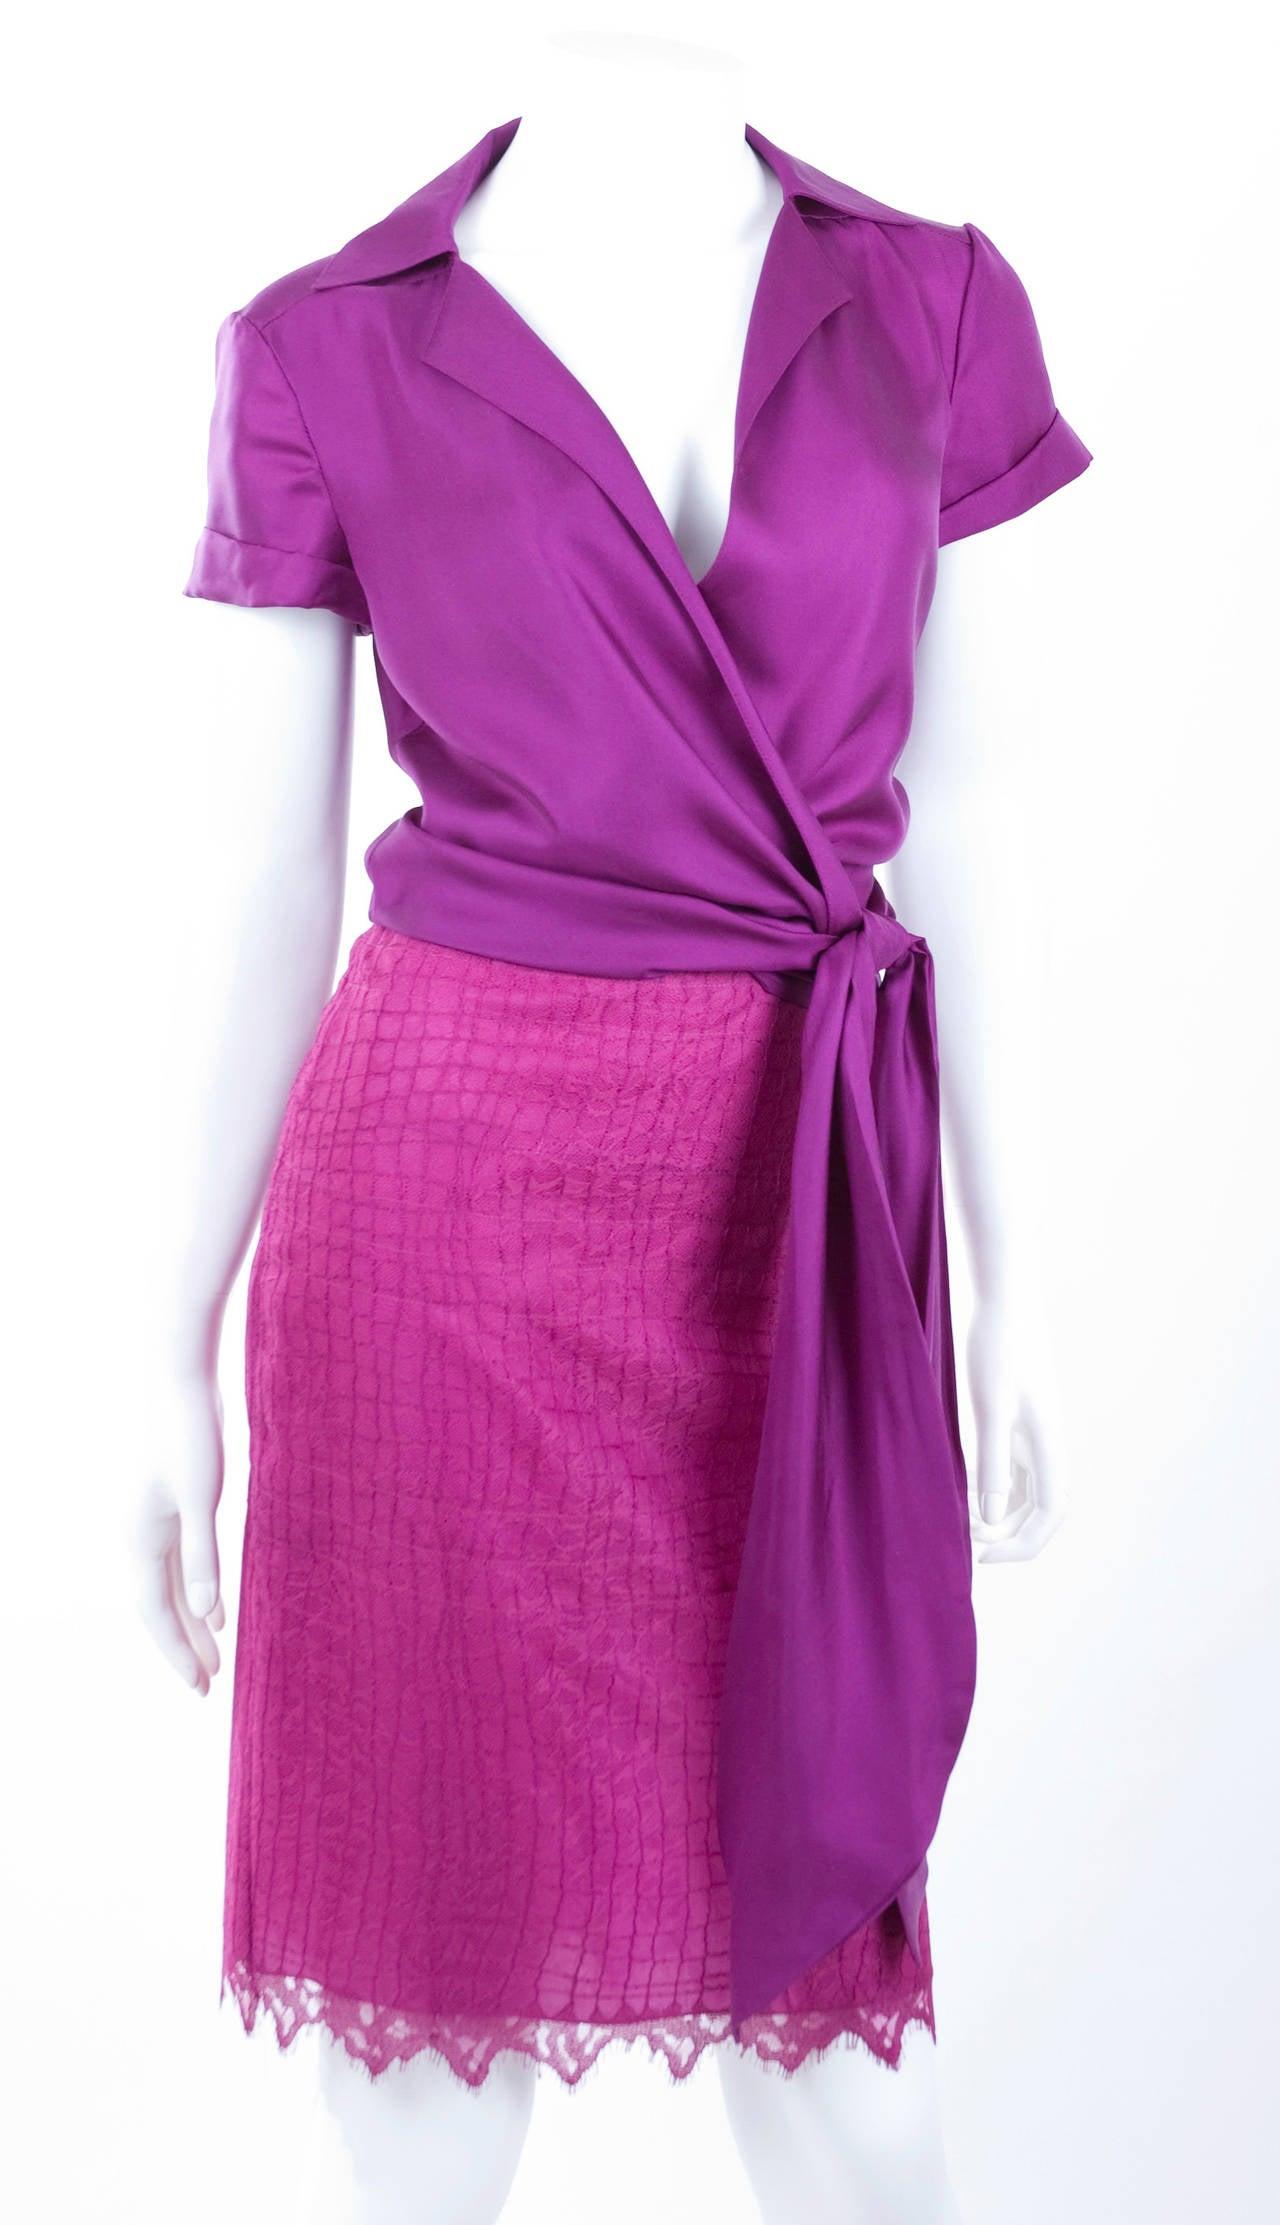 Gianni Versace Couture Ensemble 3